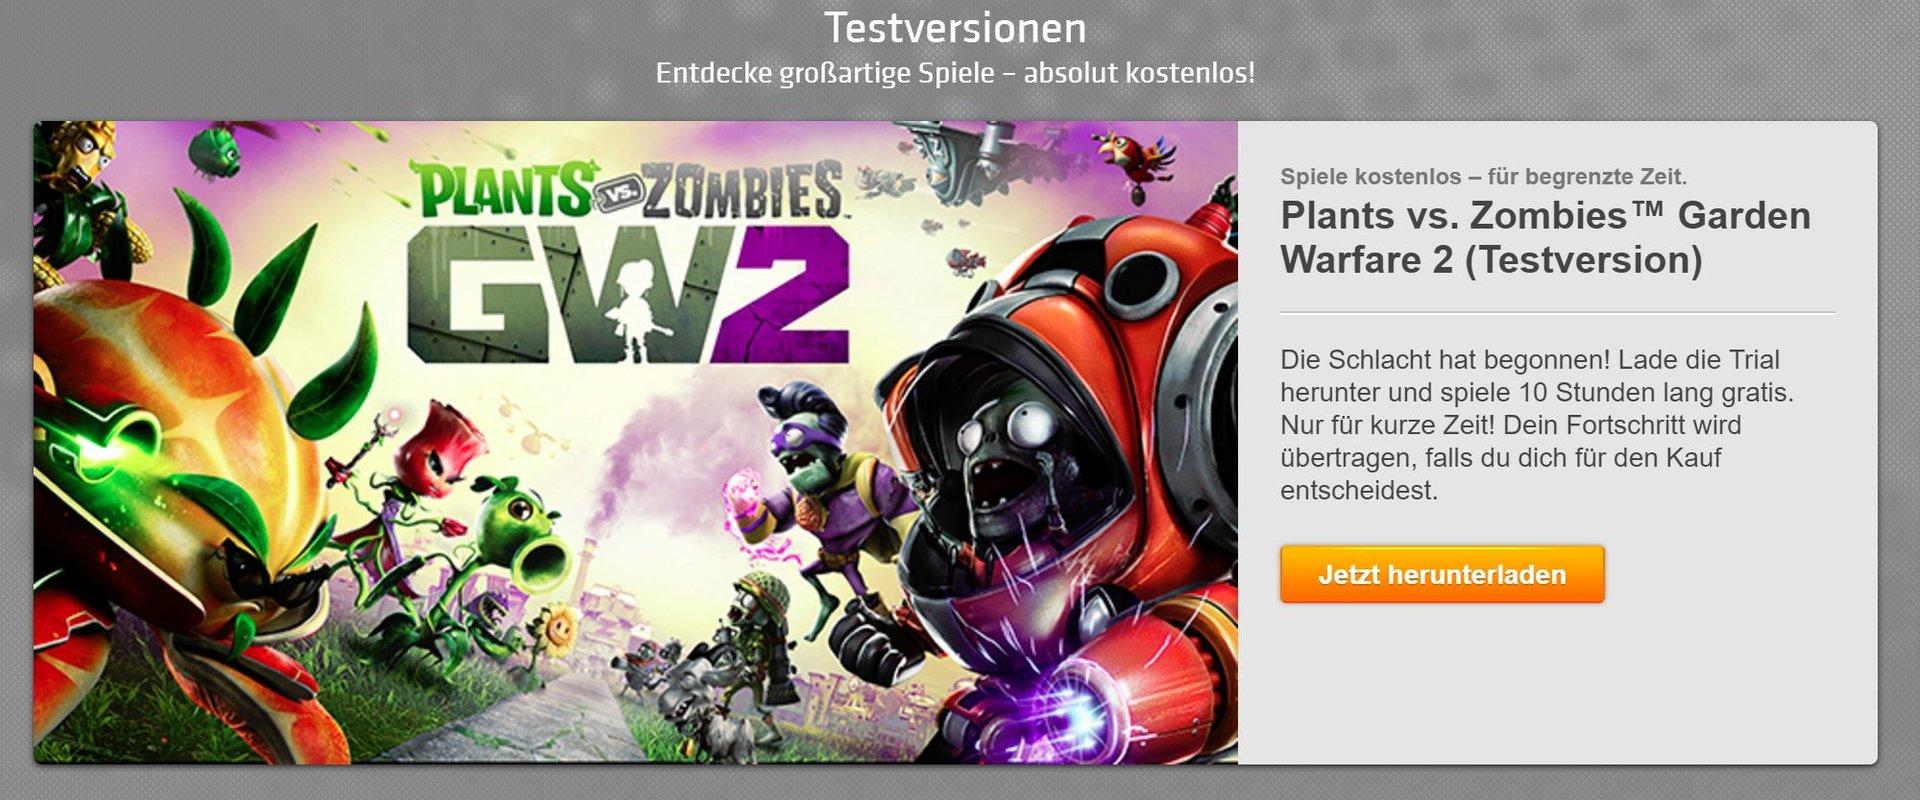 PvZ: GW 2 ist Teil das Game-Time-Angebots